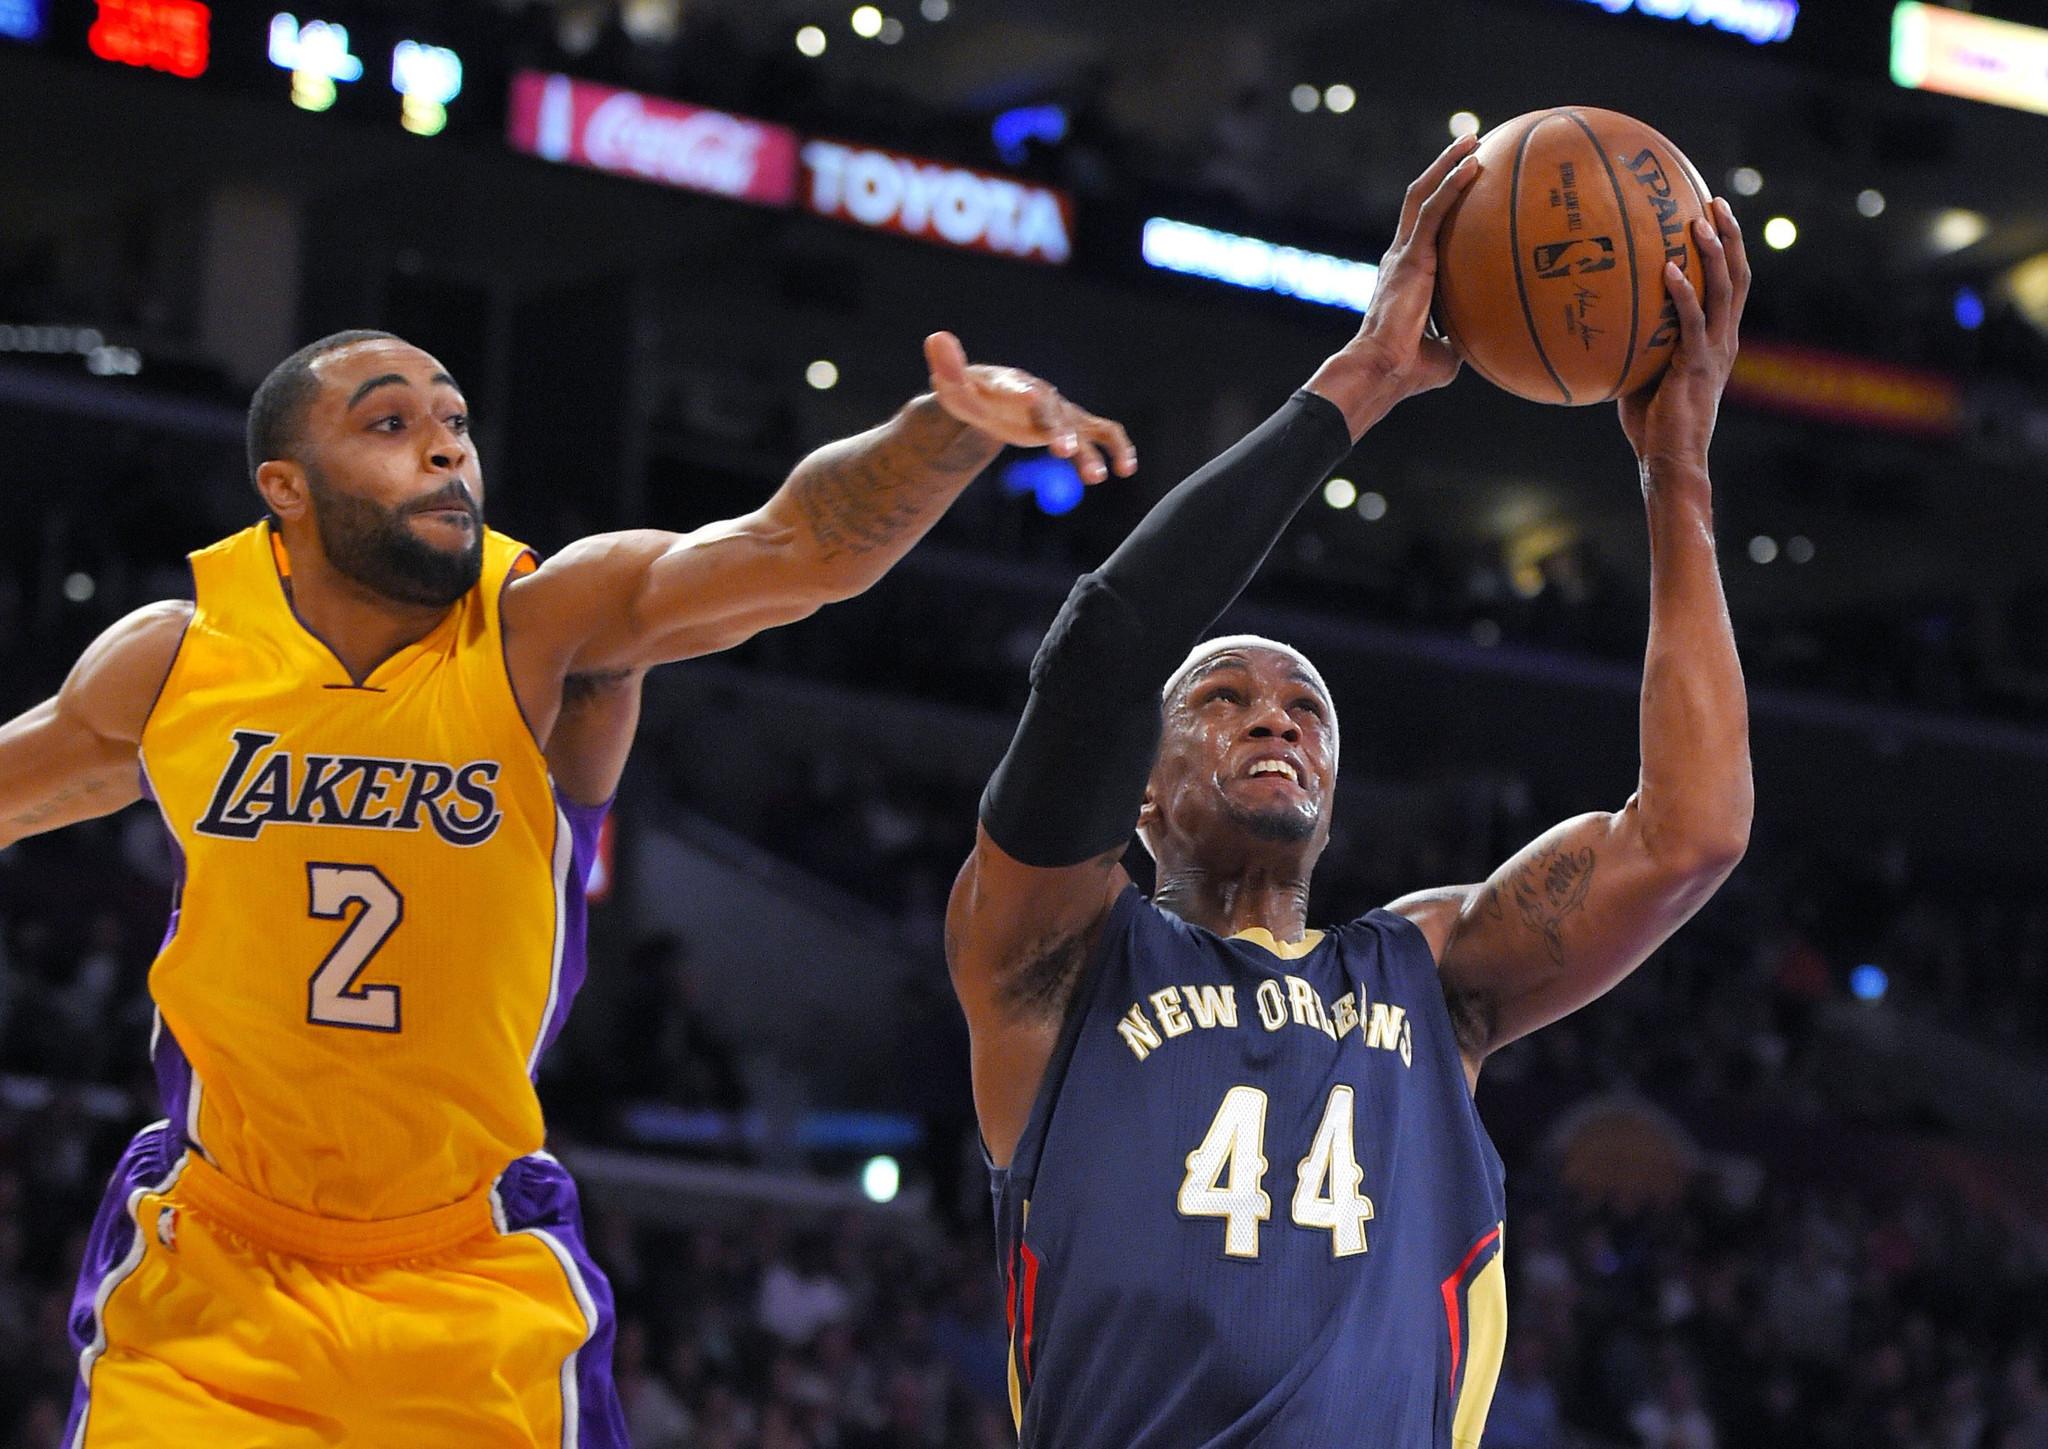 Lakers vs. New Orleans Pelicans: quarter-by-quarter updates